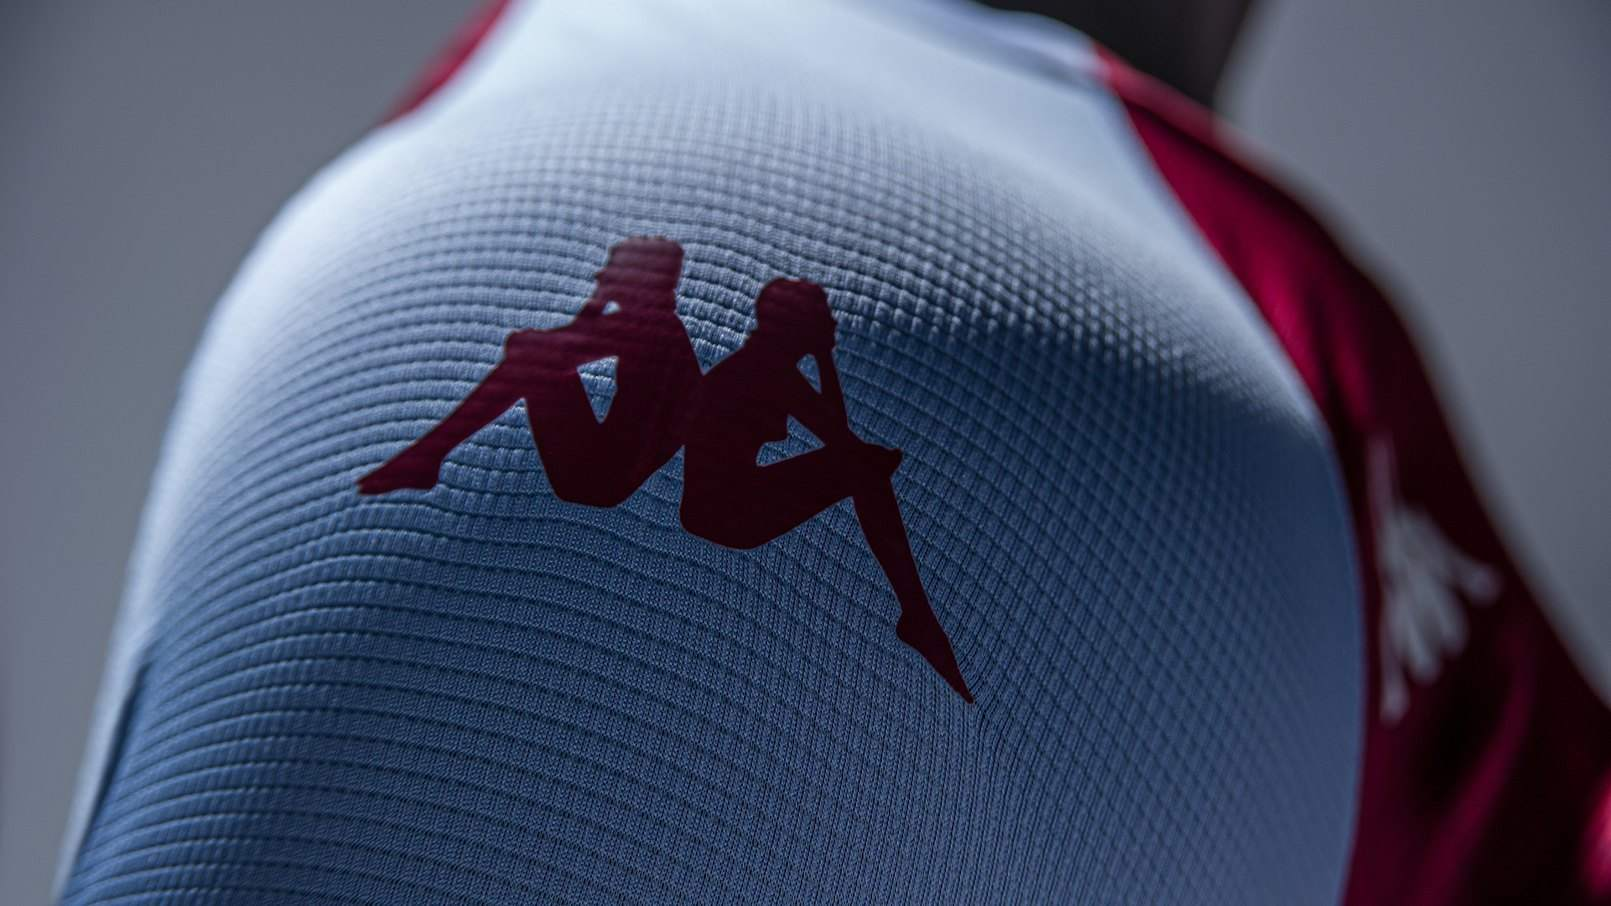 Camiseta Kappa del Aston Villa 2020/21 | Imagen Web Oficial